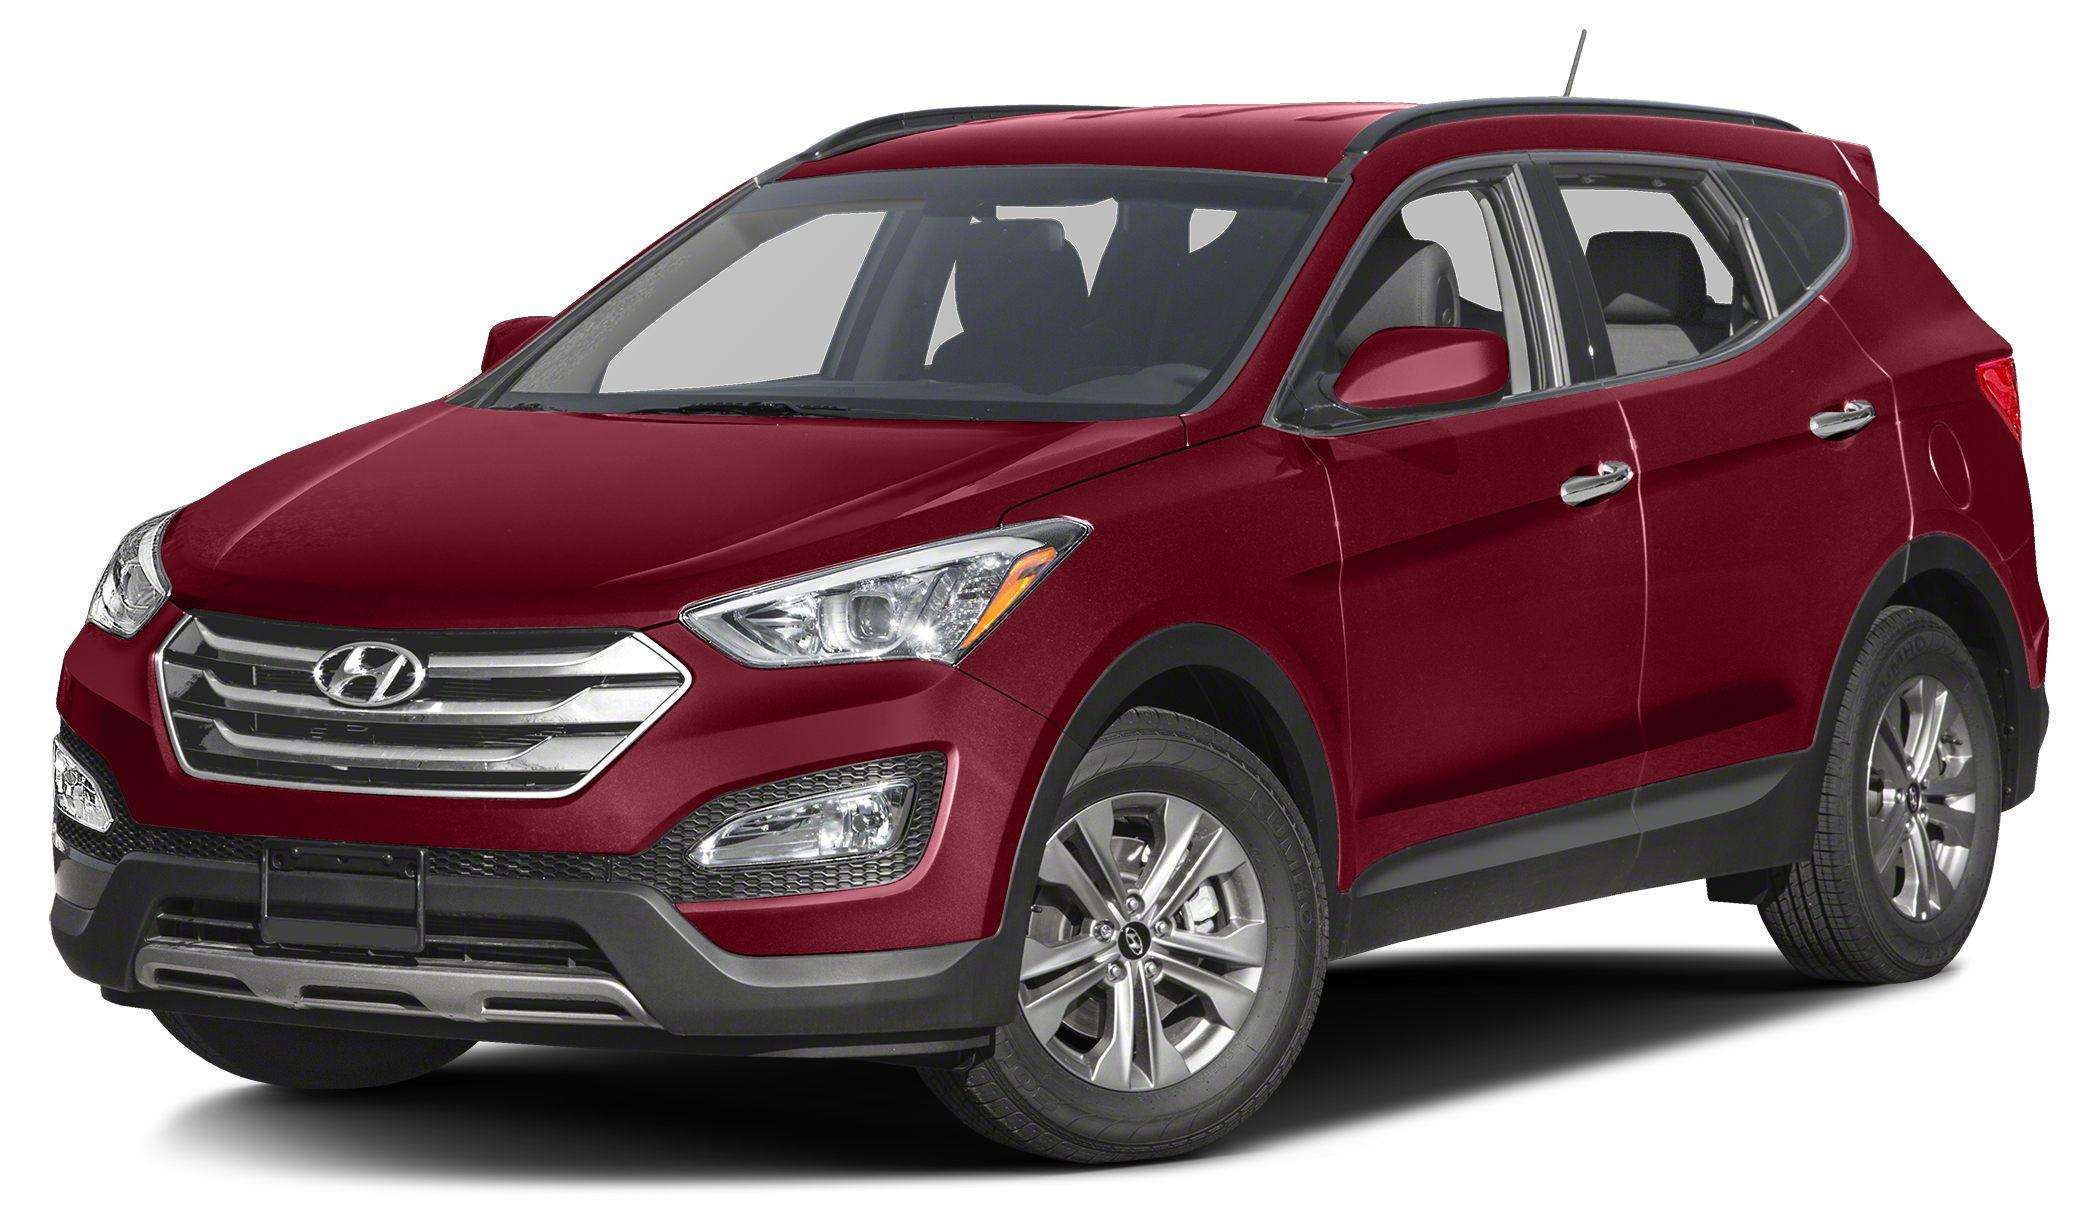 2016 Hyundai Santa Fe Sport 24 Miles 27701Color Serrano Red Stock JBE6219 VIN 5XYZT3LB1GG33